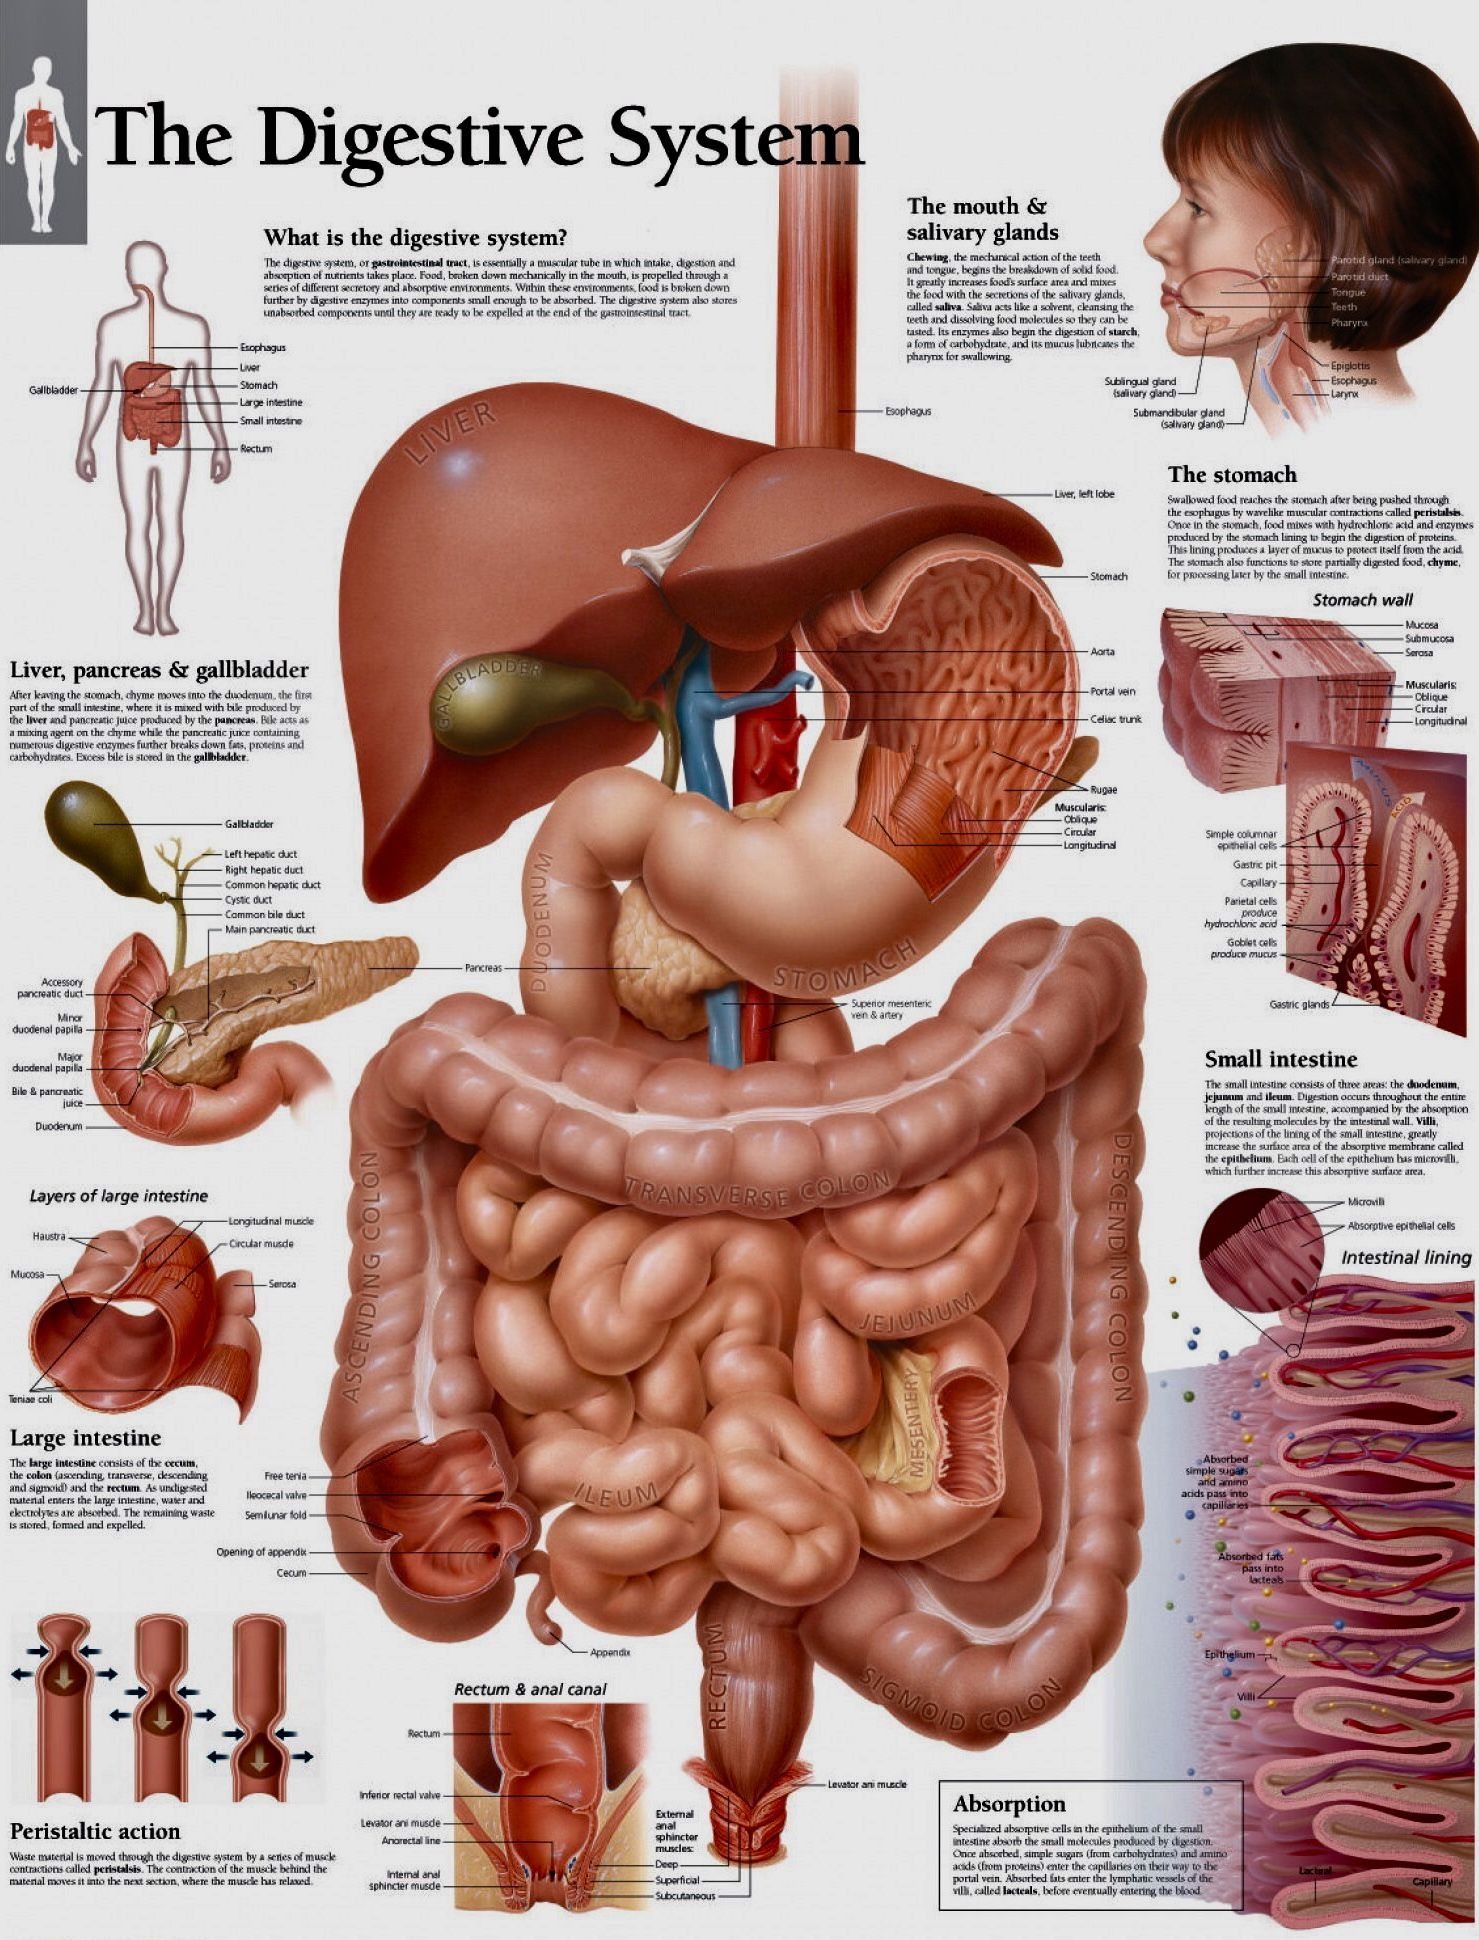 Digestive system | Human digestive system, Digestive ...